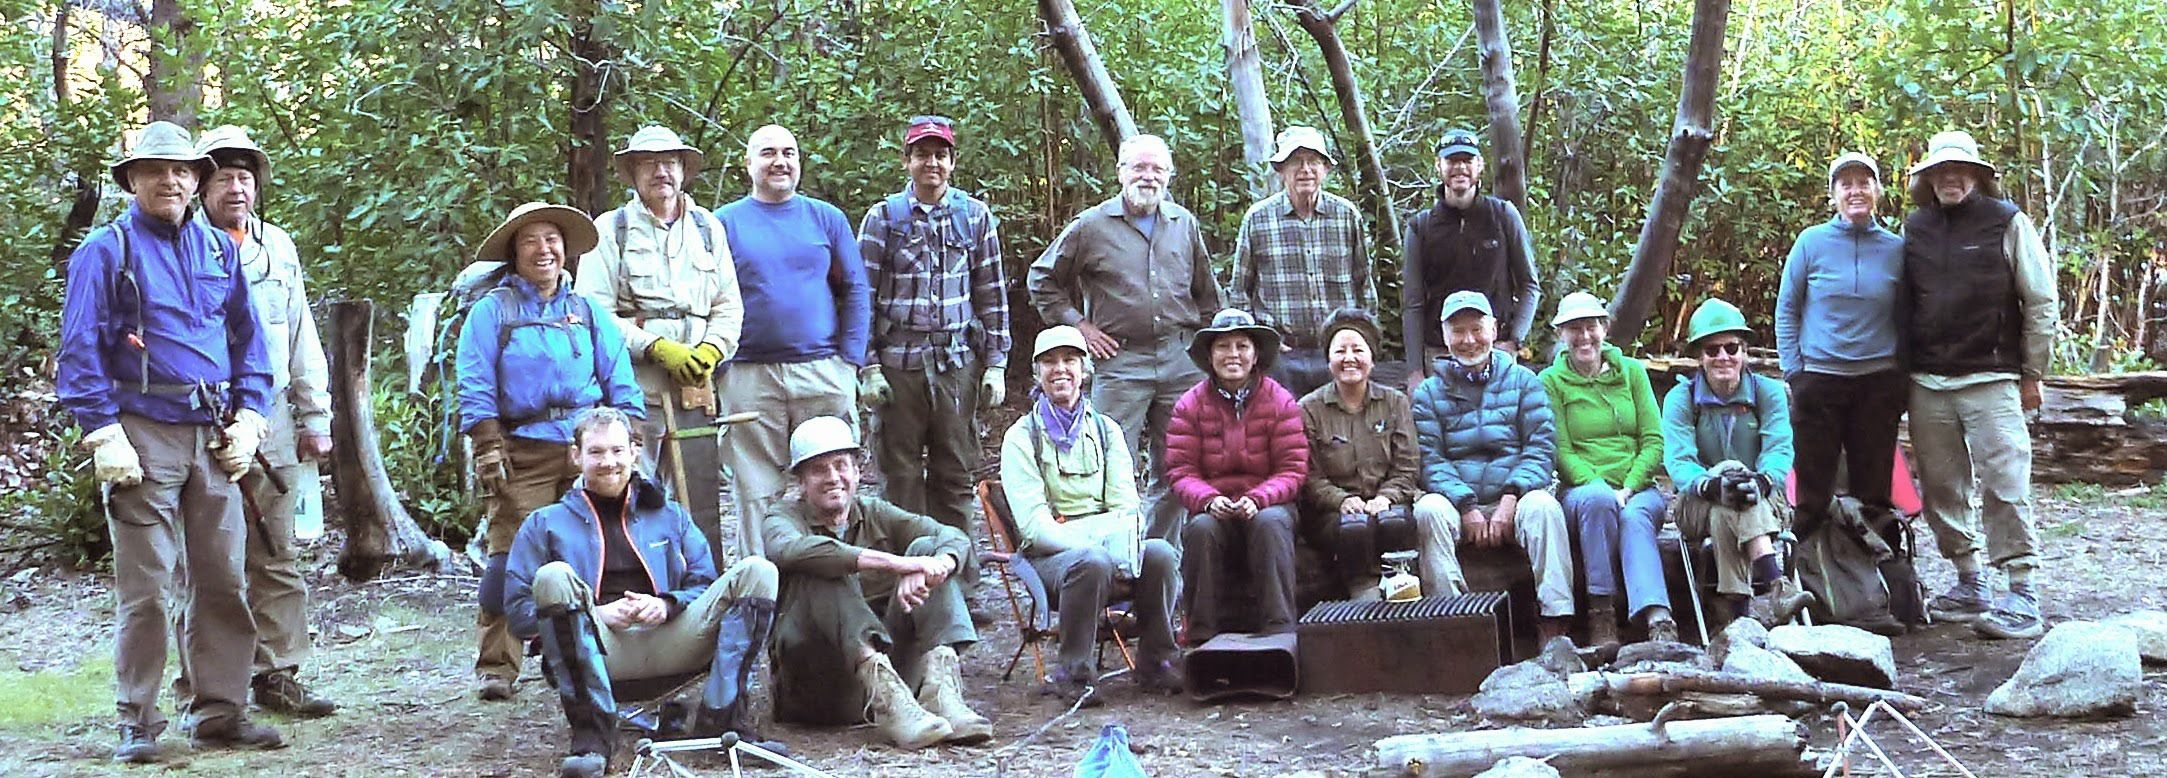 Car Camping Trail Crew Weekend at Memorial Pa